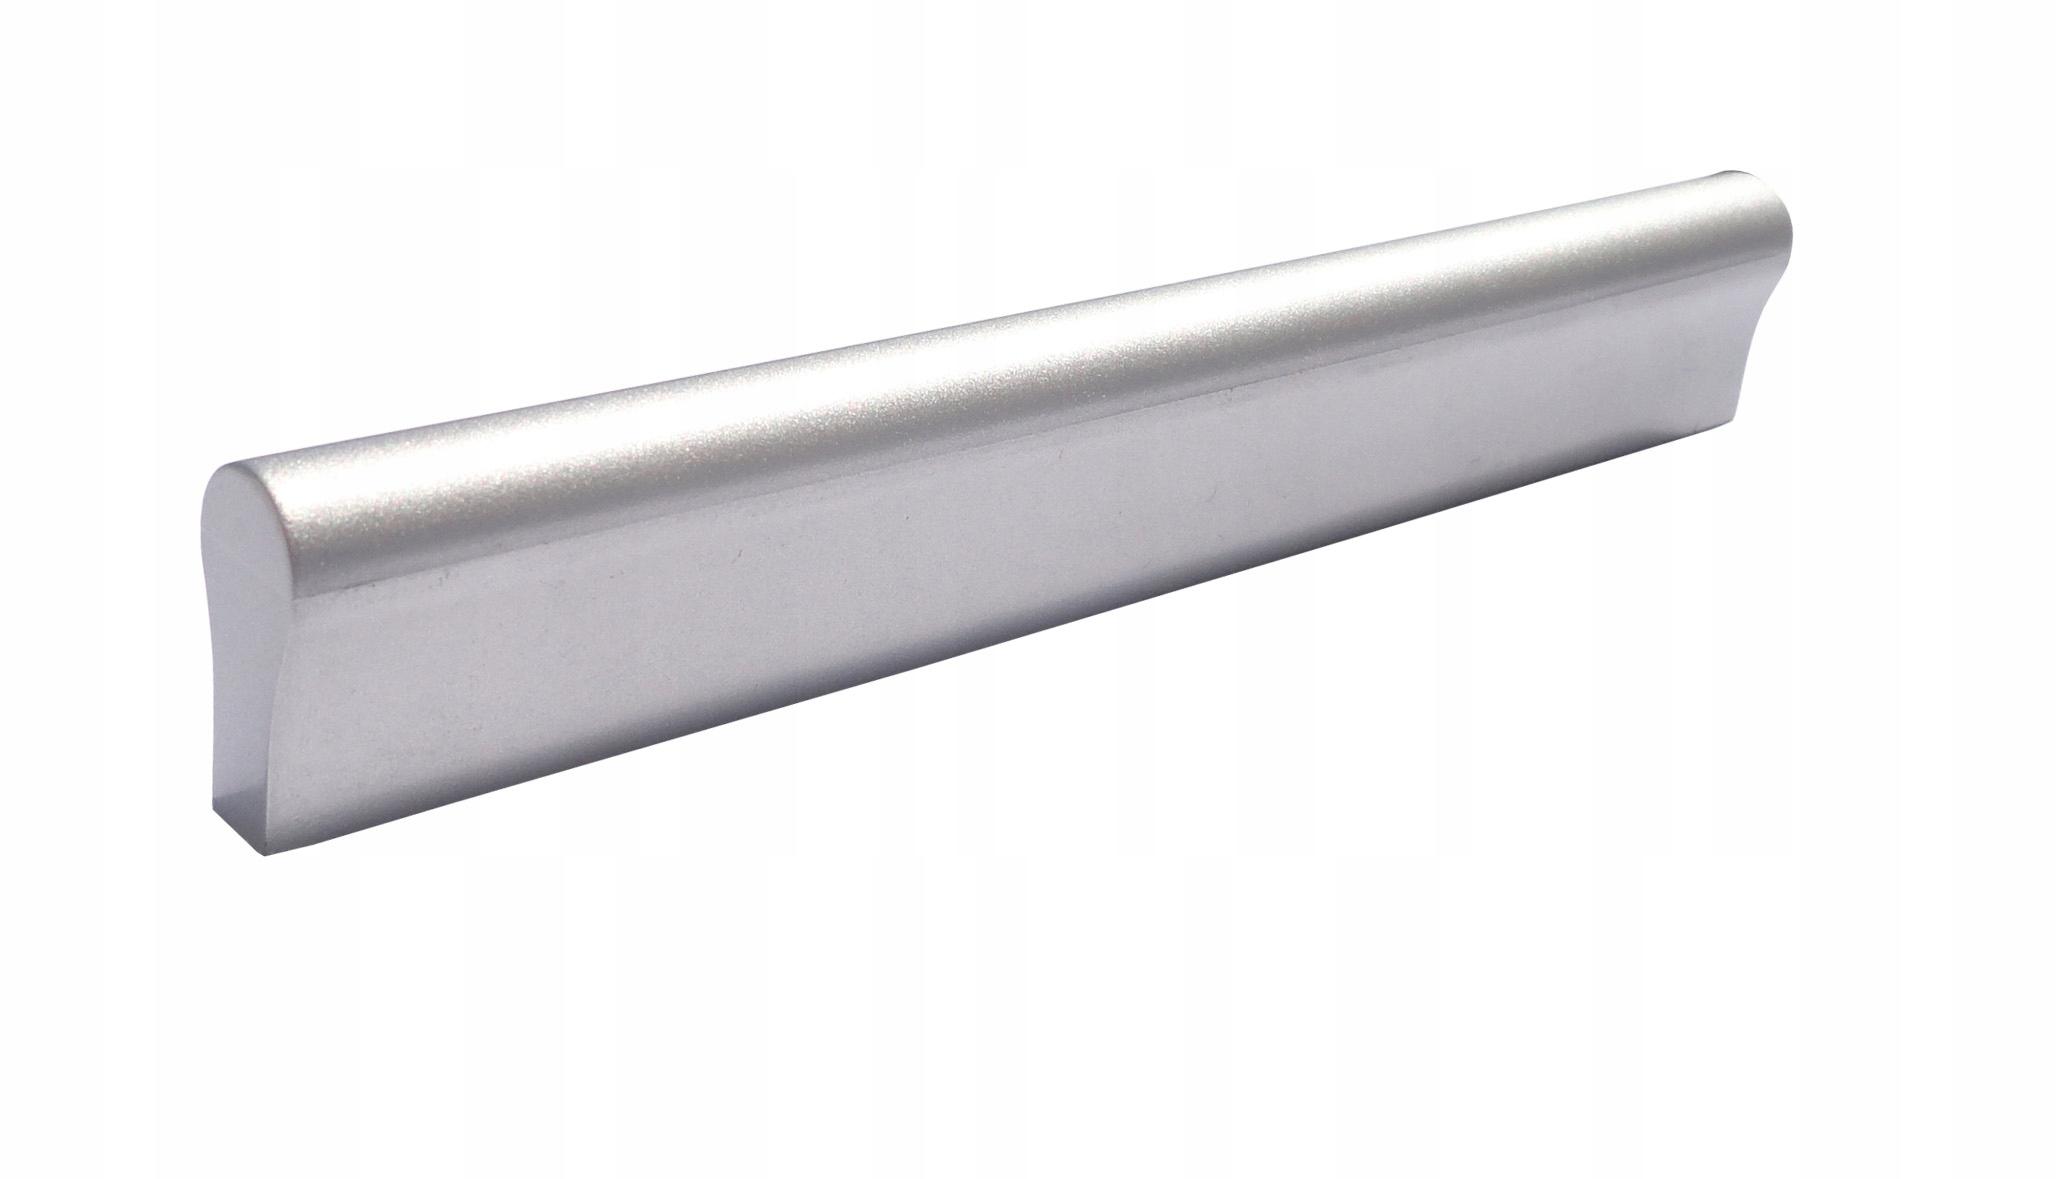 Uchwyt meblowy rączka Srebrny 96mm 128mm + wkręty